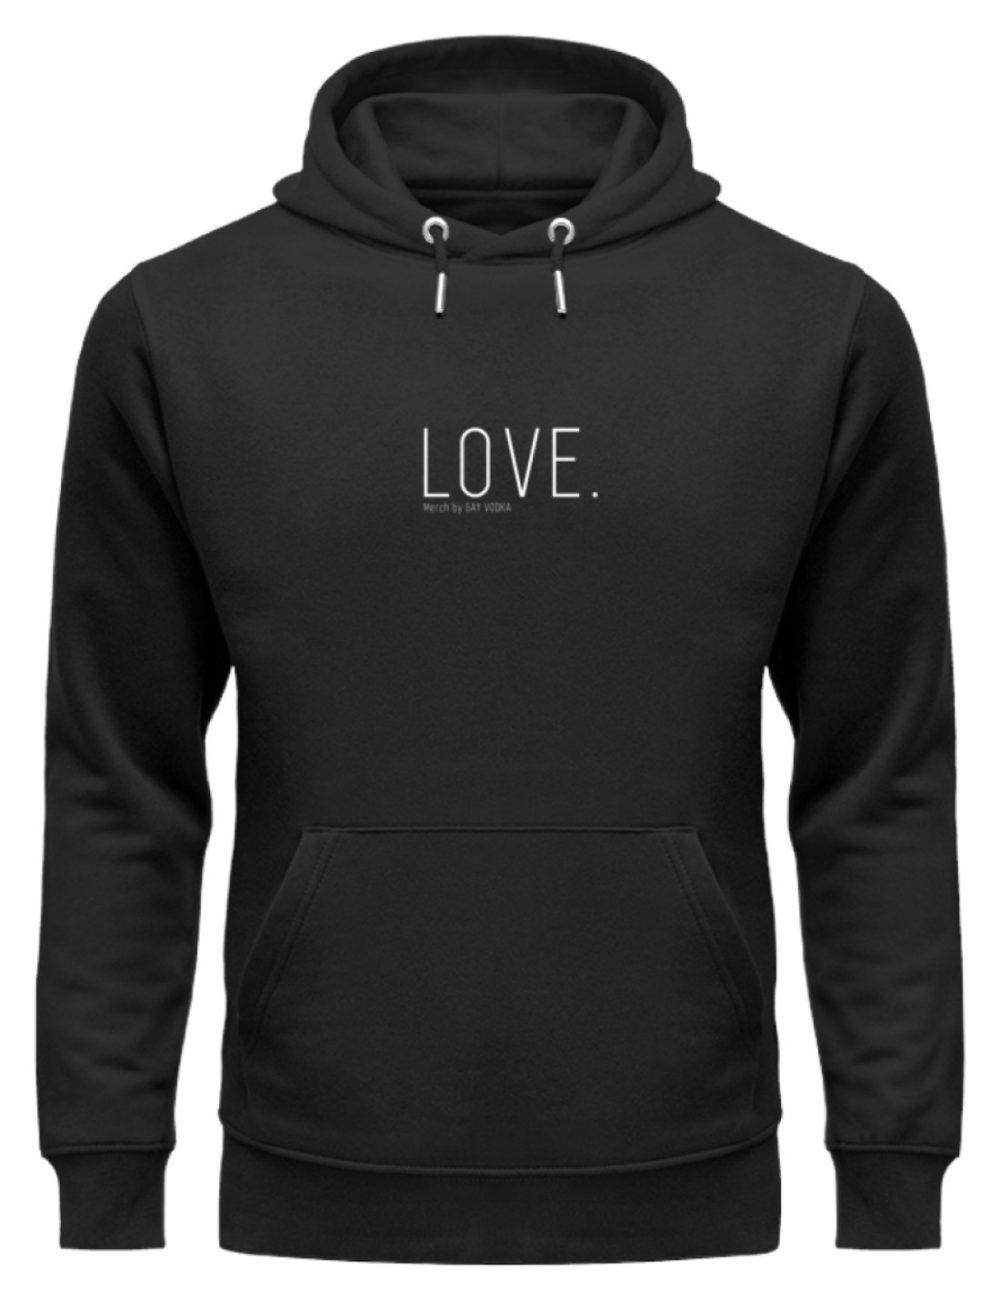 LOVE. - Unisex Organic Hoodie-16